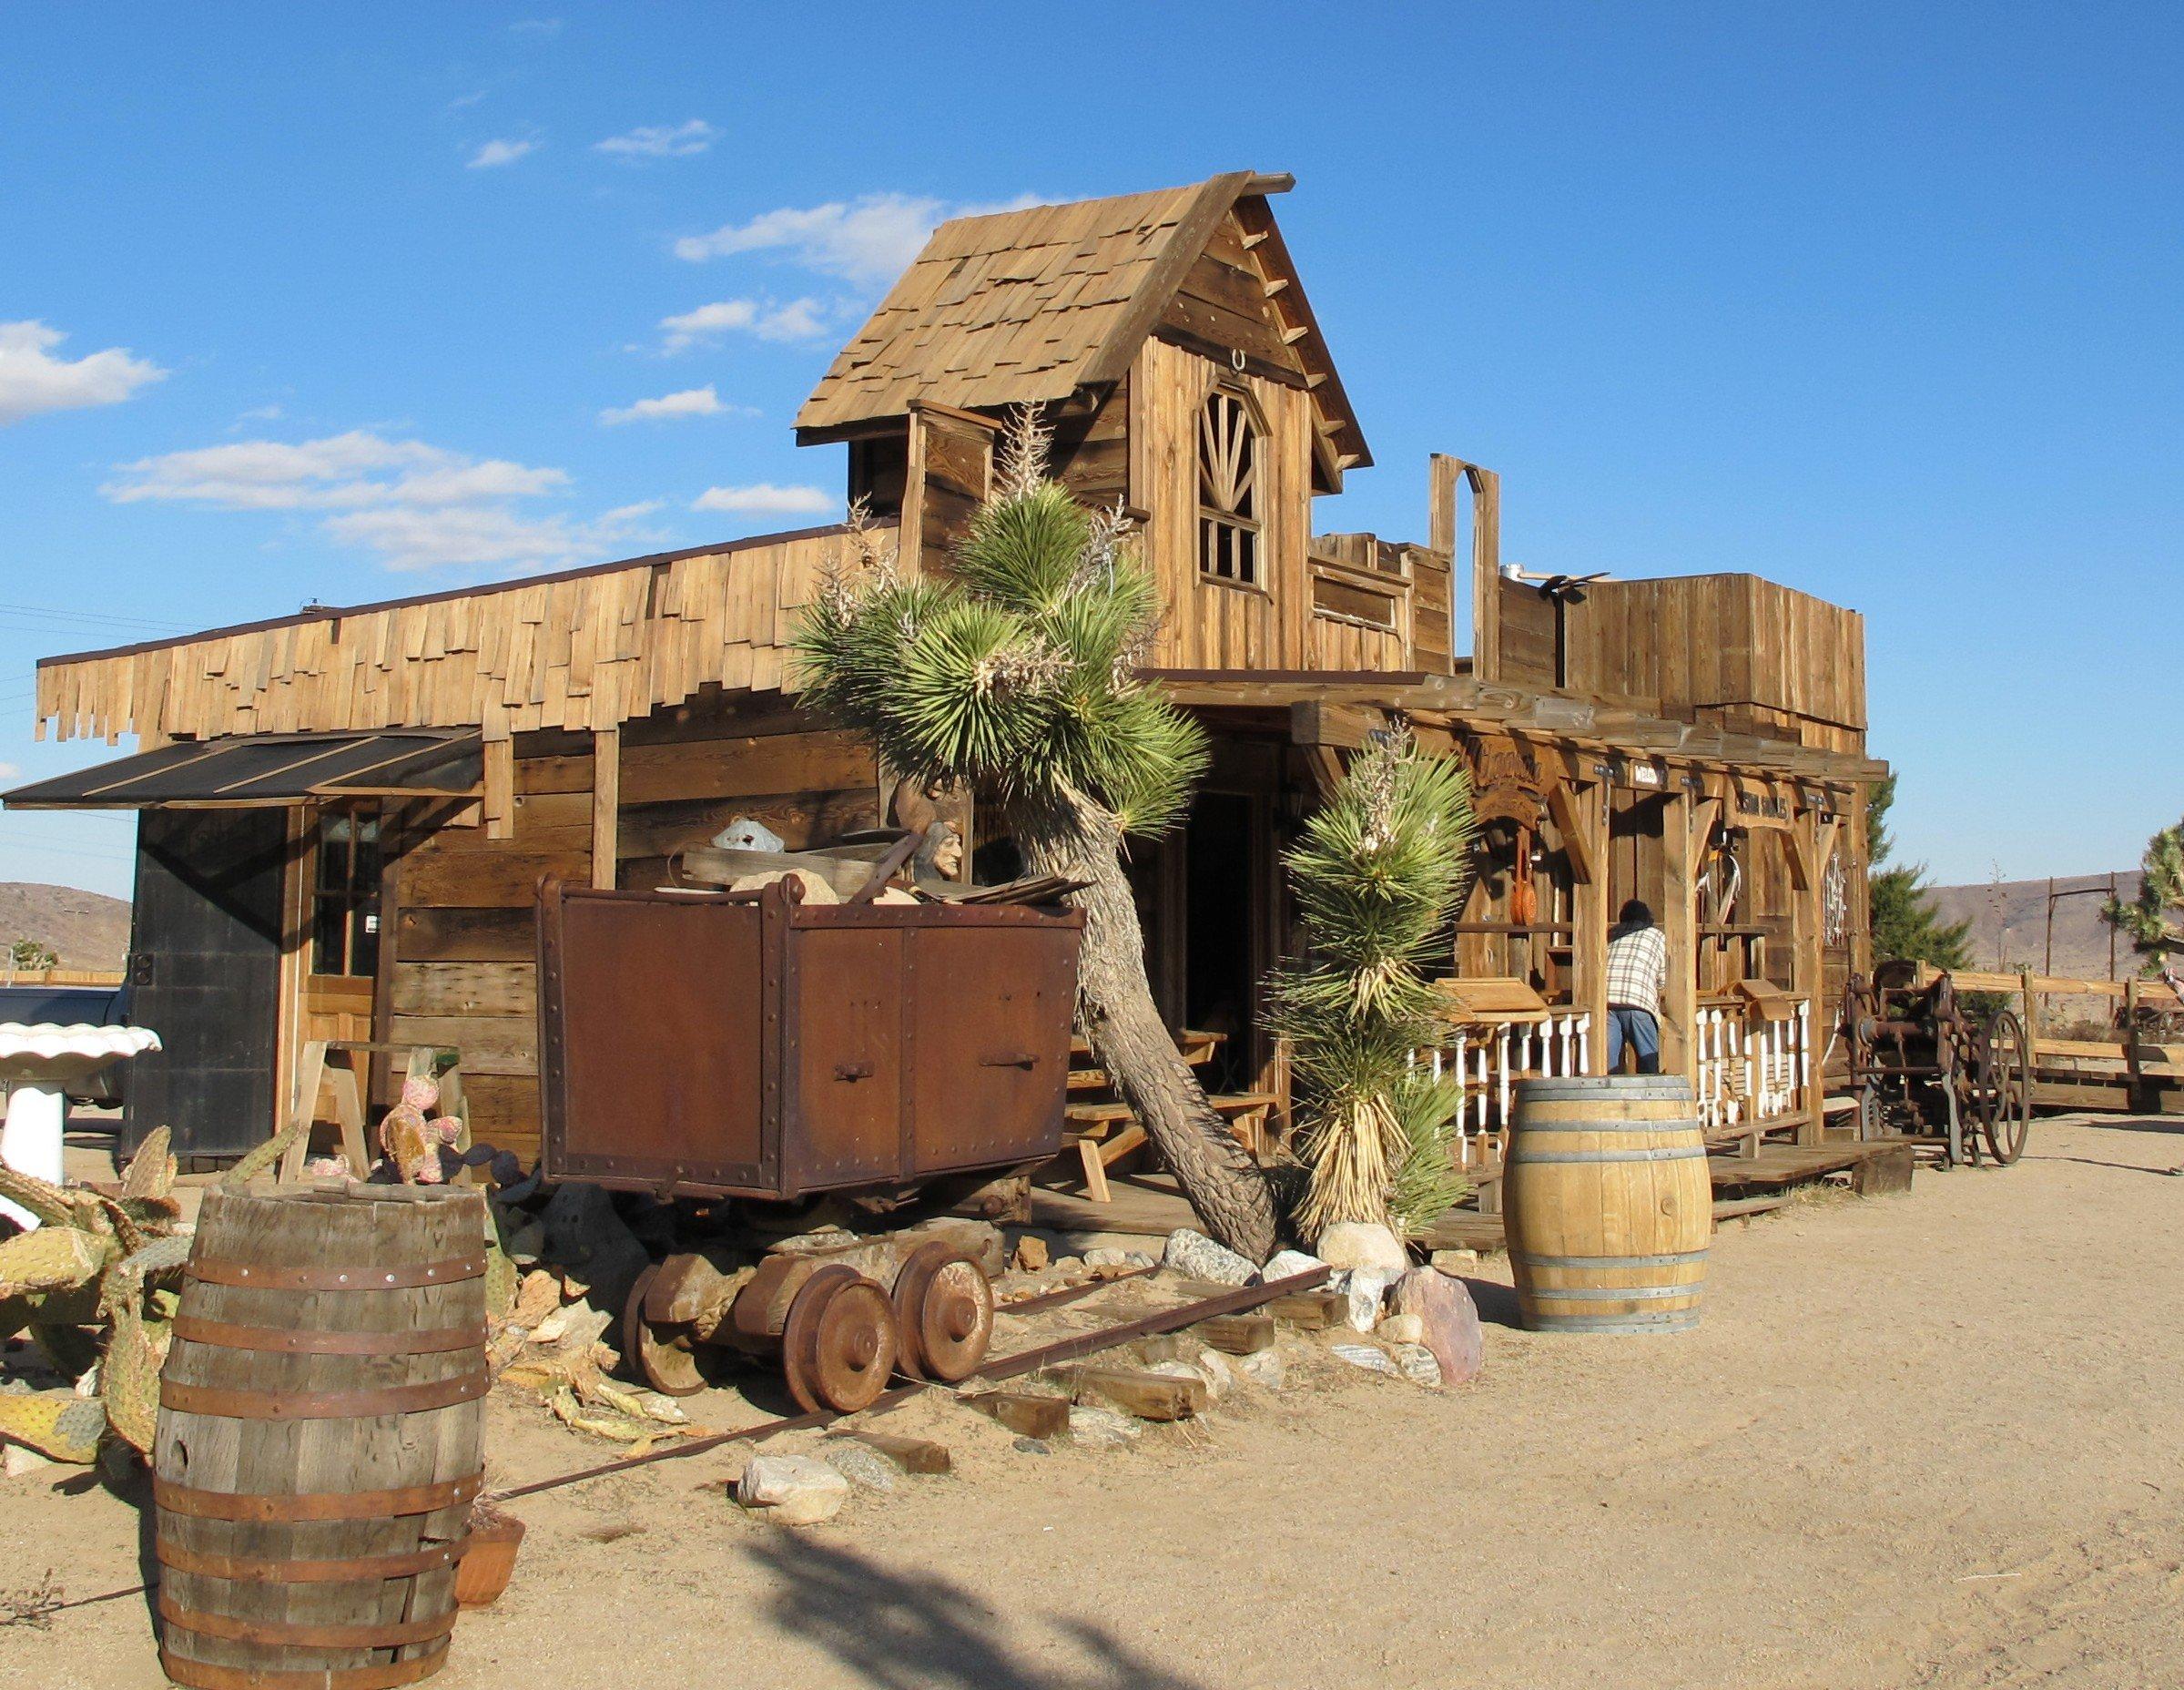 Trolley In Huis : Gratis afbeeldingen hout oud huis hut dorp trolley keet